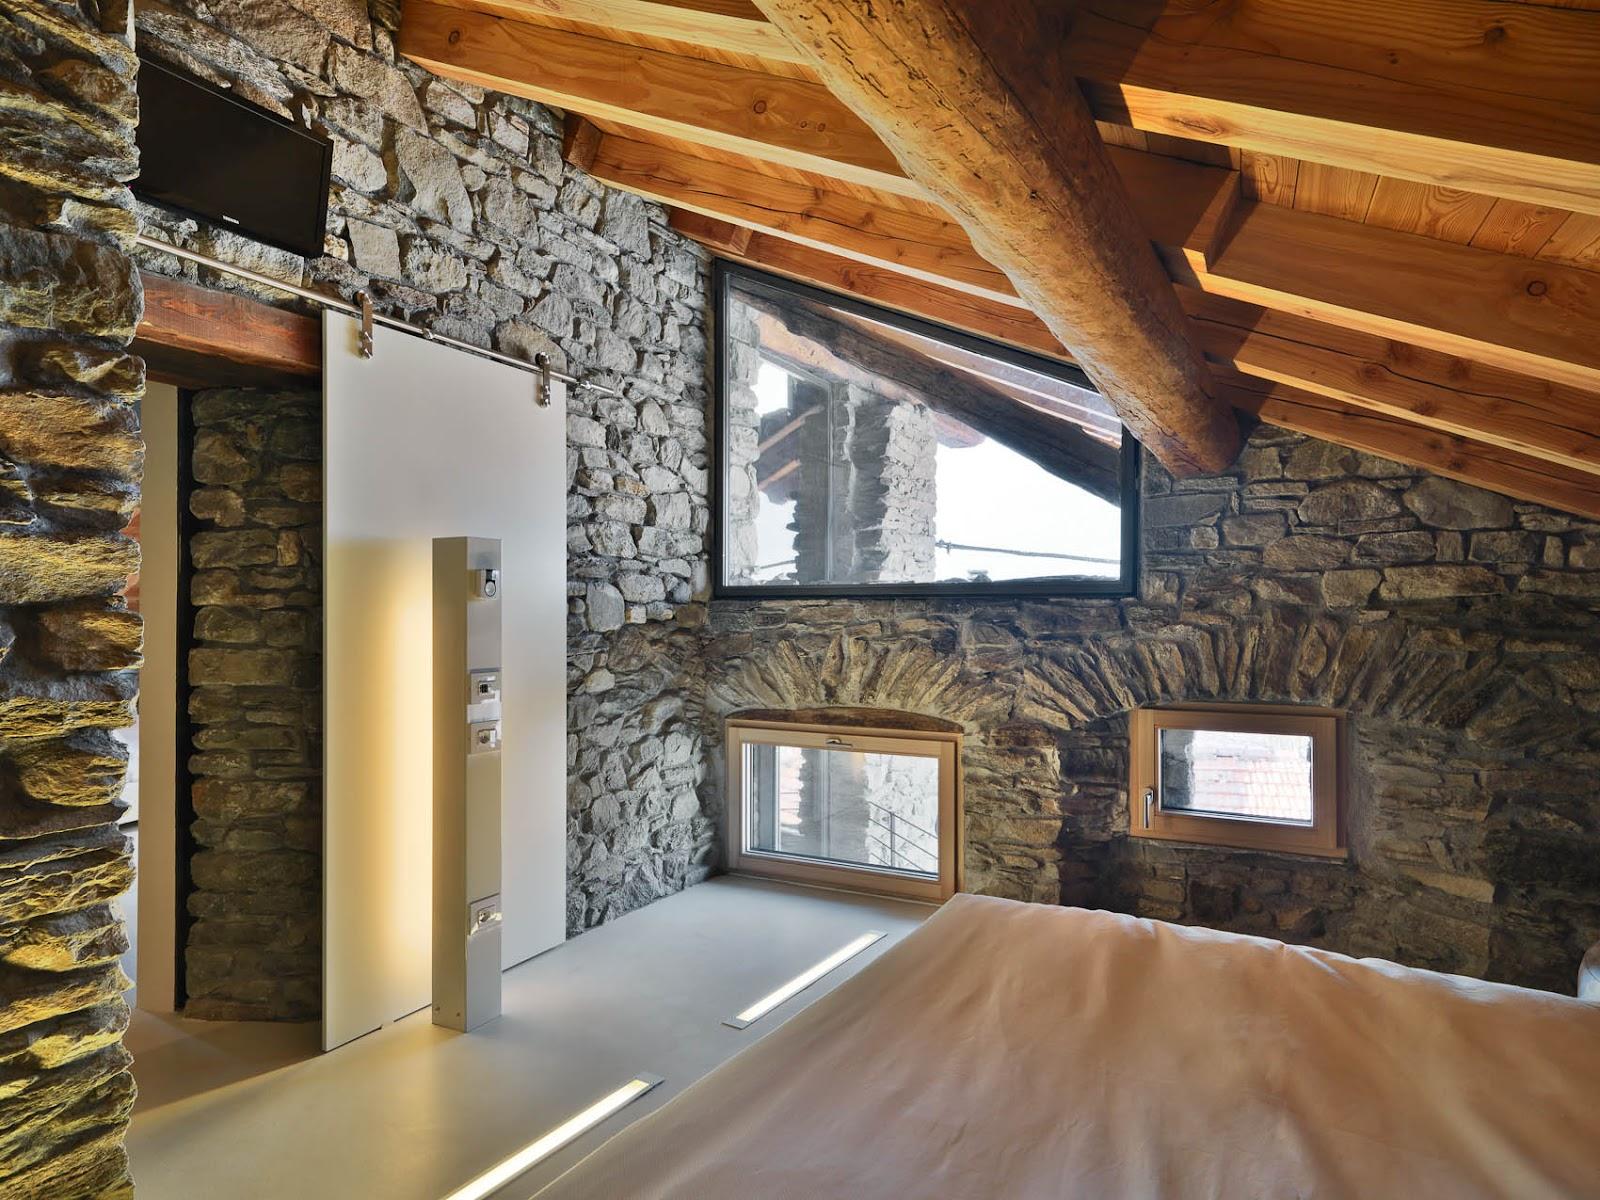 neo arquitecturaymas espectaculares interiores en madera